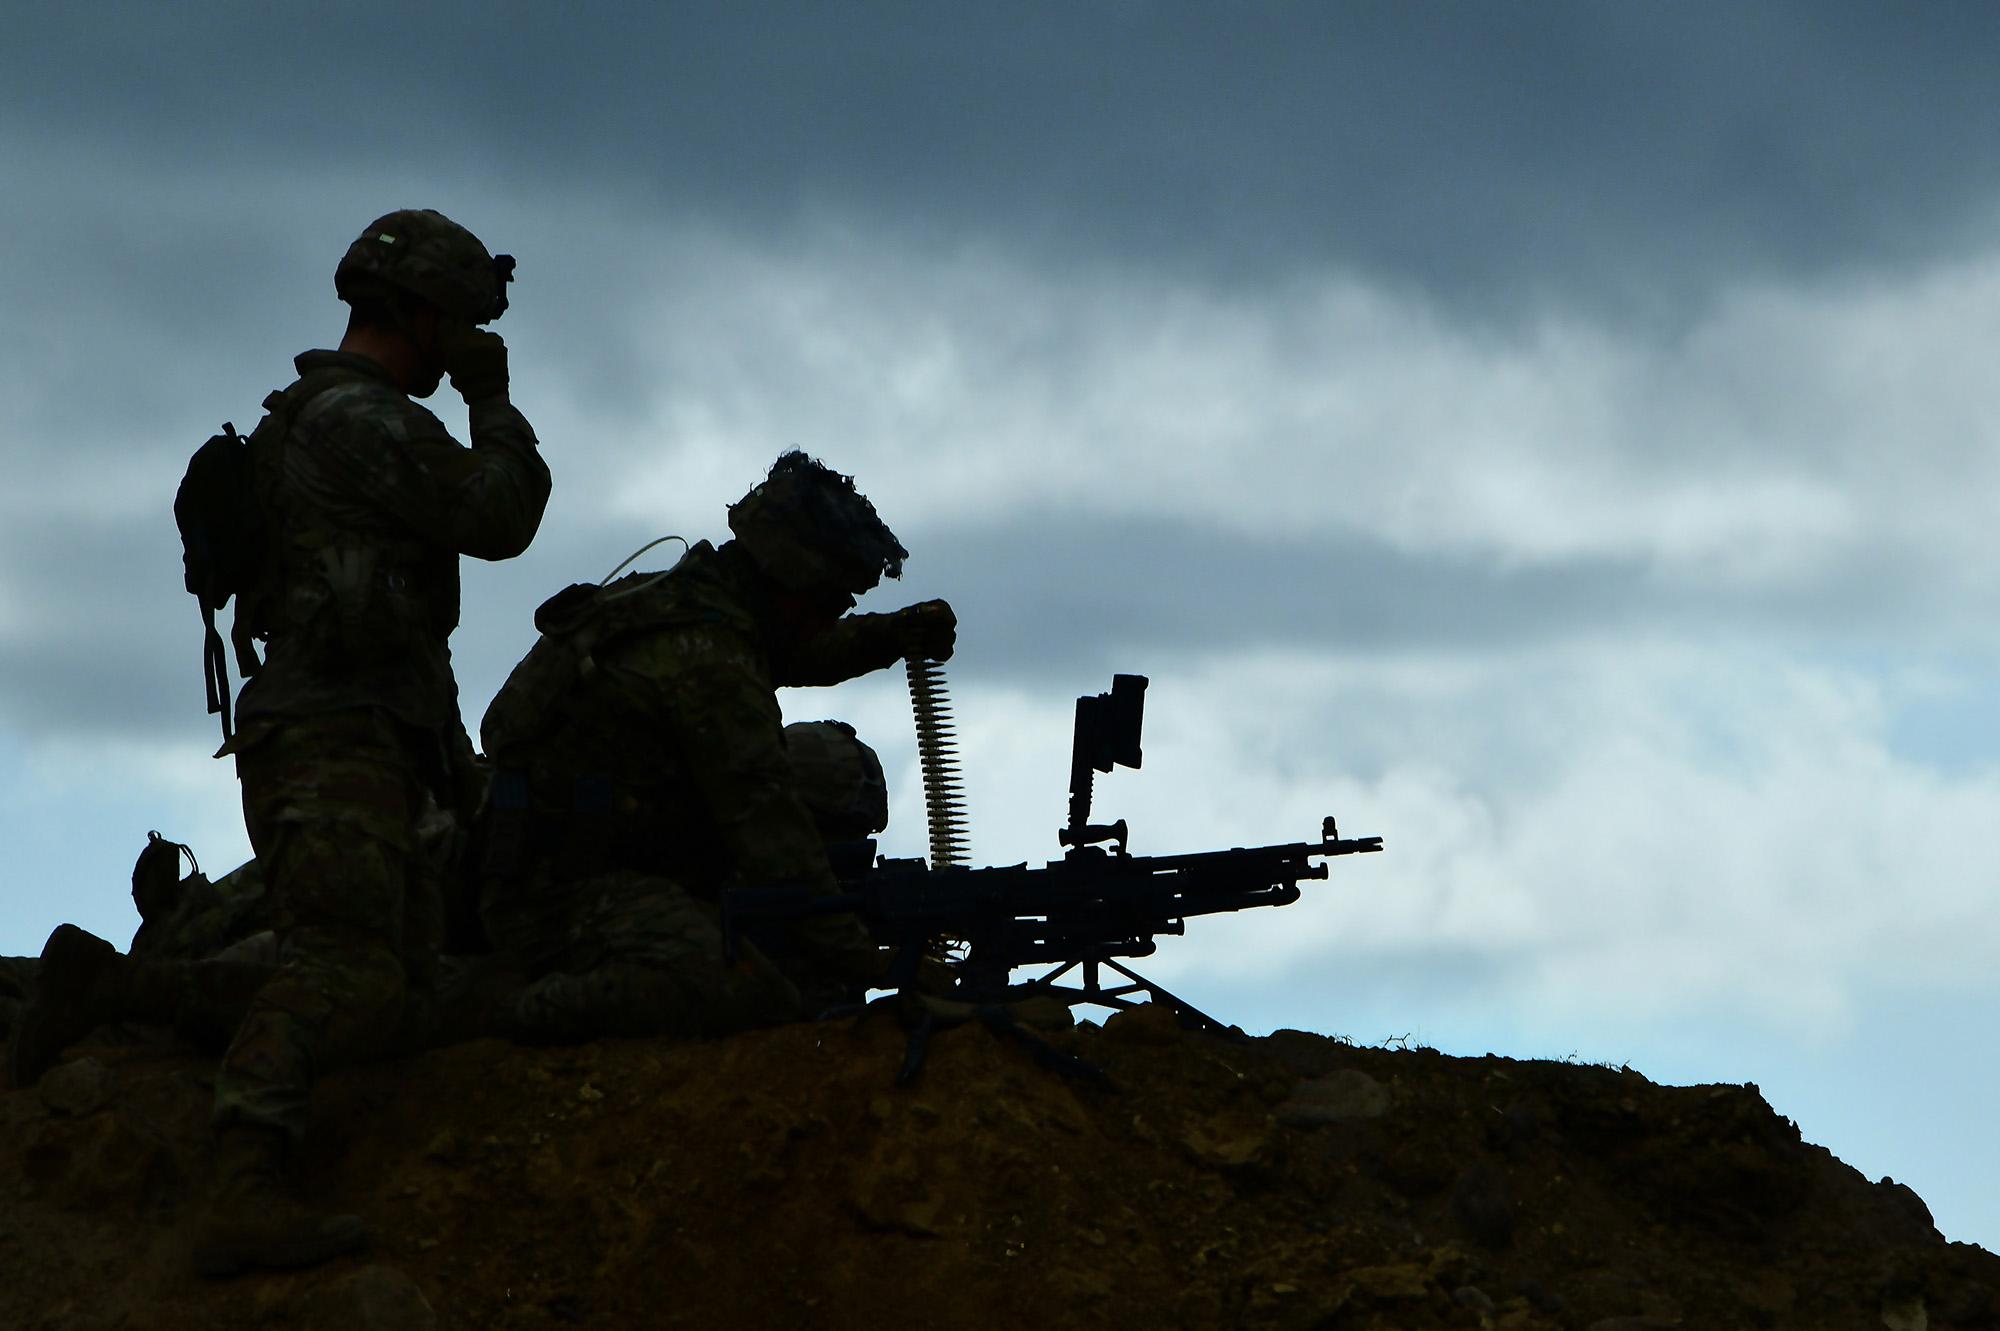 U.S. Army paratroopers participate in M240 machine gun long-range marksmanship March 18, 2021, as part of Eagle Pangea at the Italian Army Capo Teulada Major Training Area, Sardinia, Italy. (Elena Baladelli/Army)